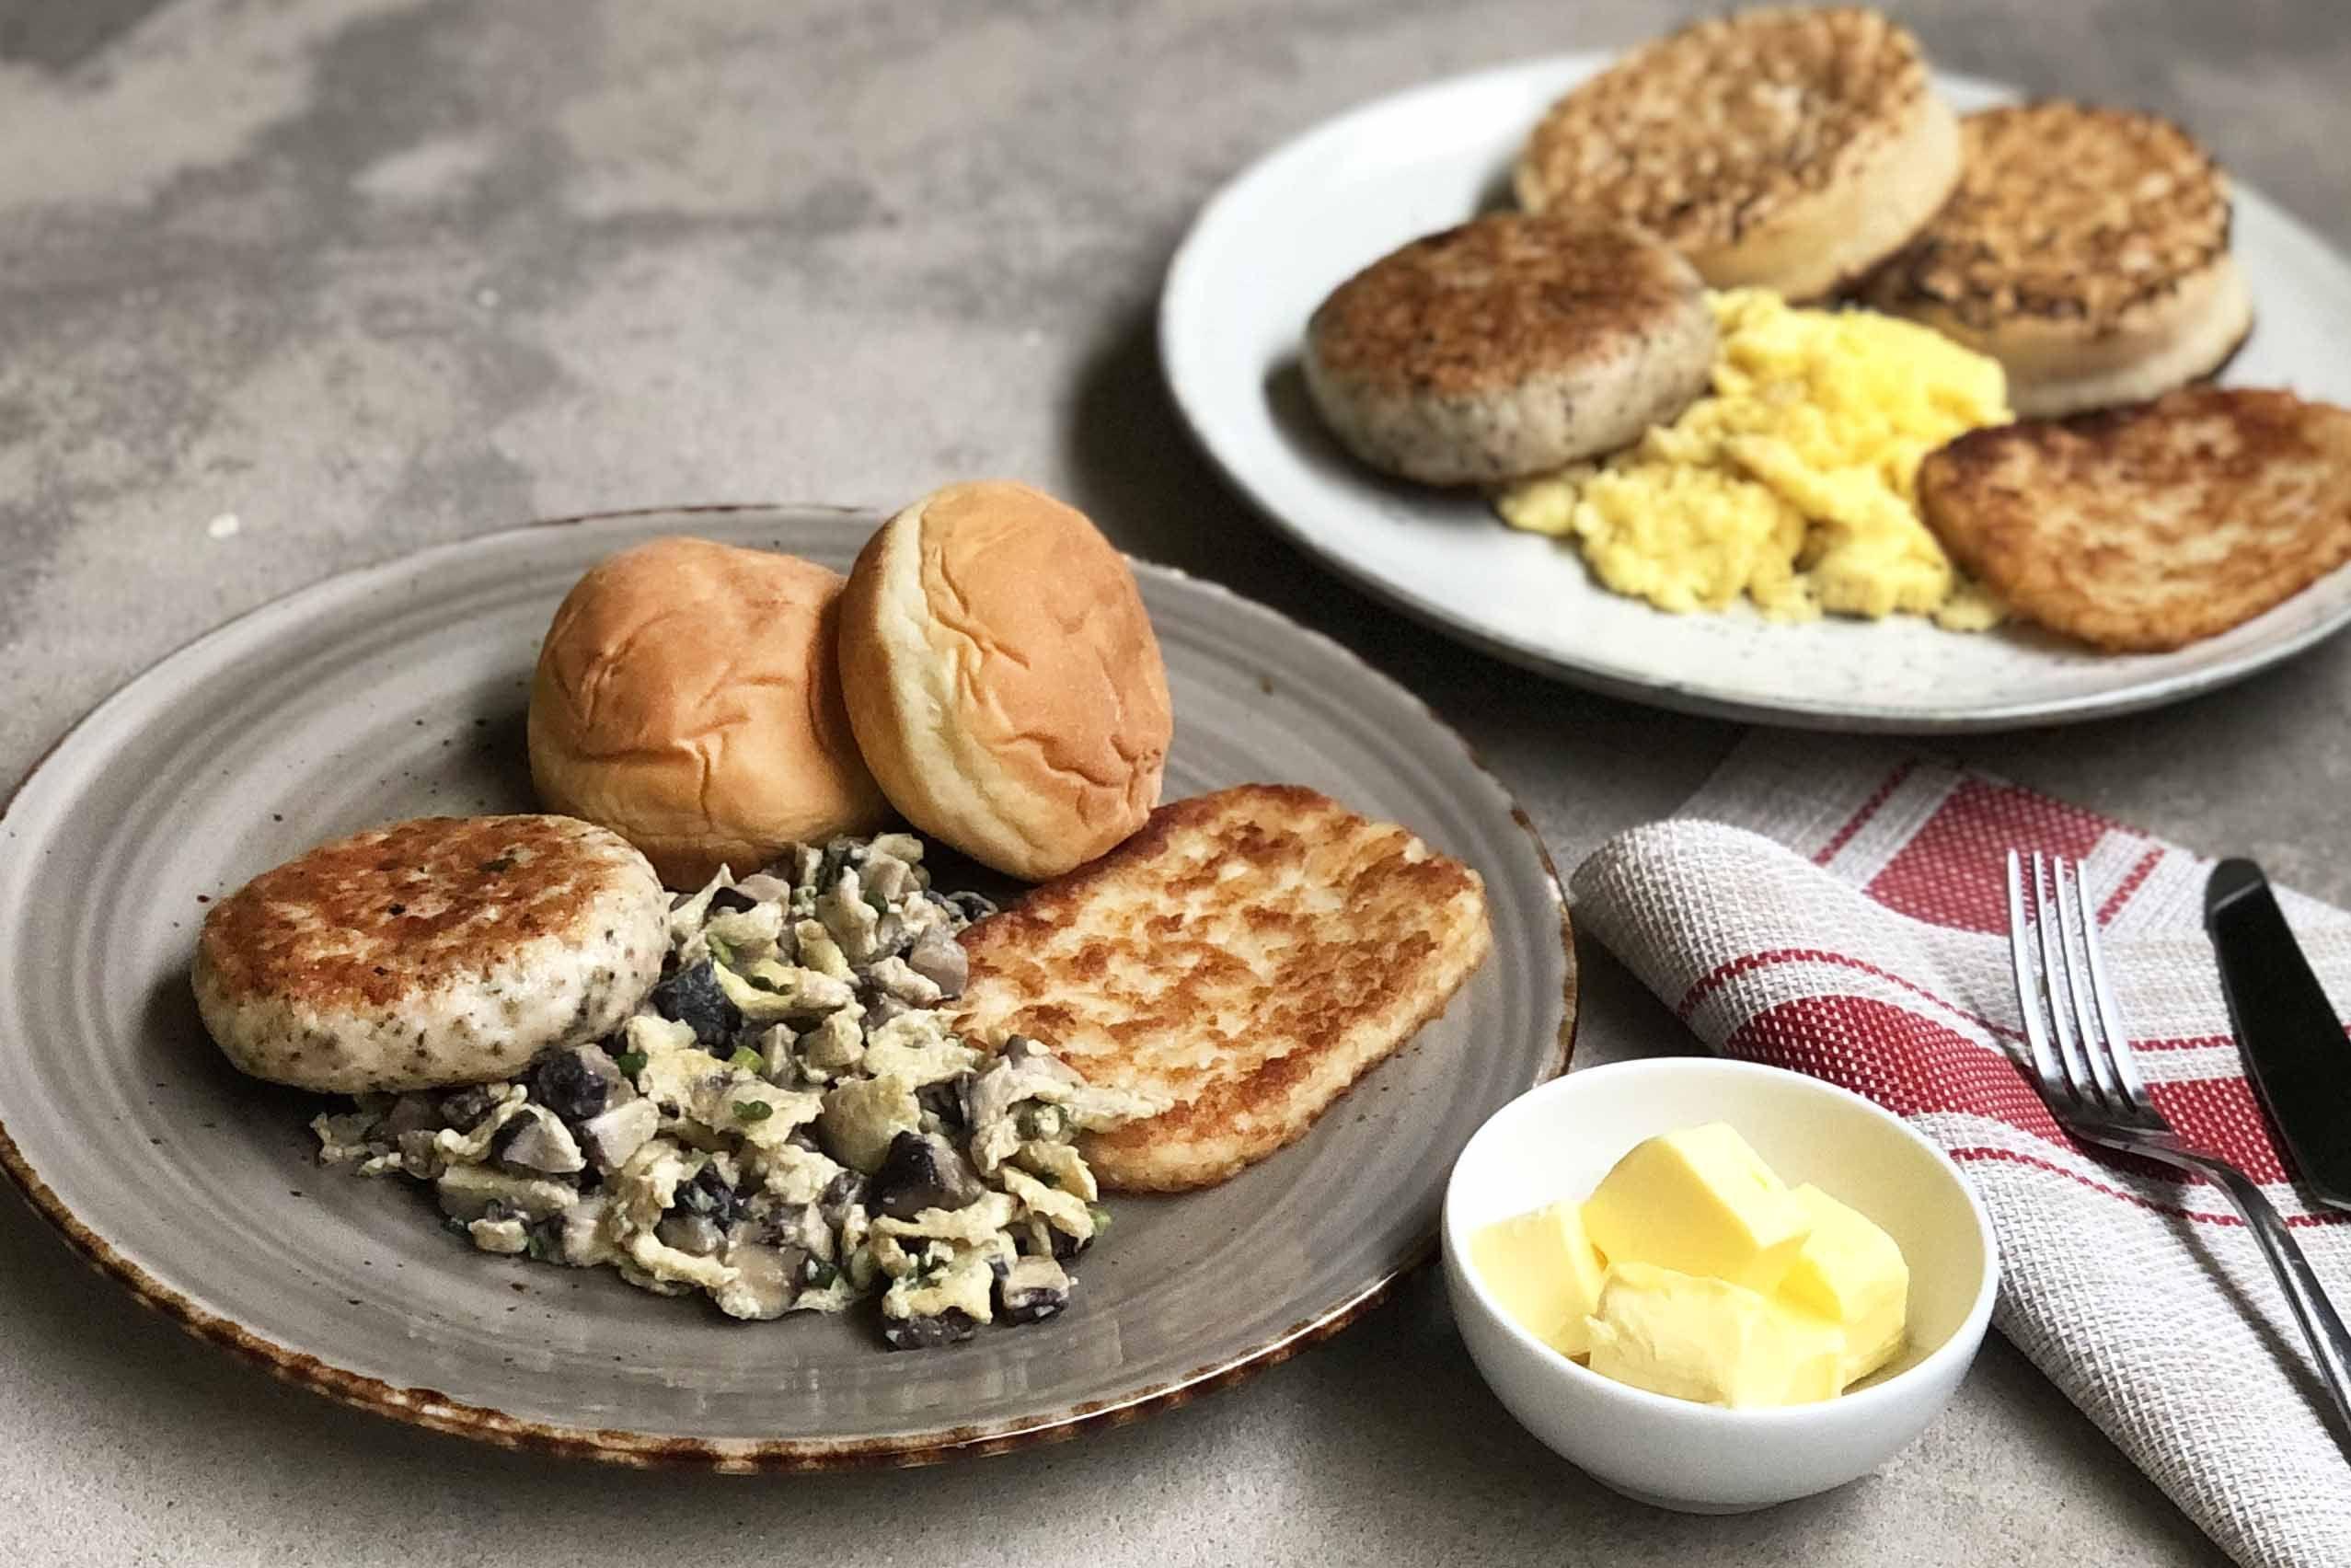 Mcdonald S Inspired Hearty Big Breakfast 2 Ways Recipe Breakfast Food Tasting Asian Food Channel